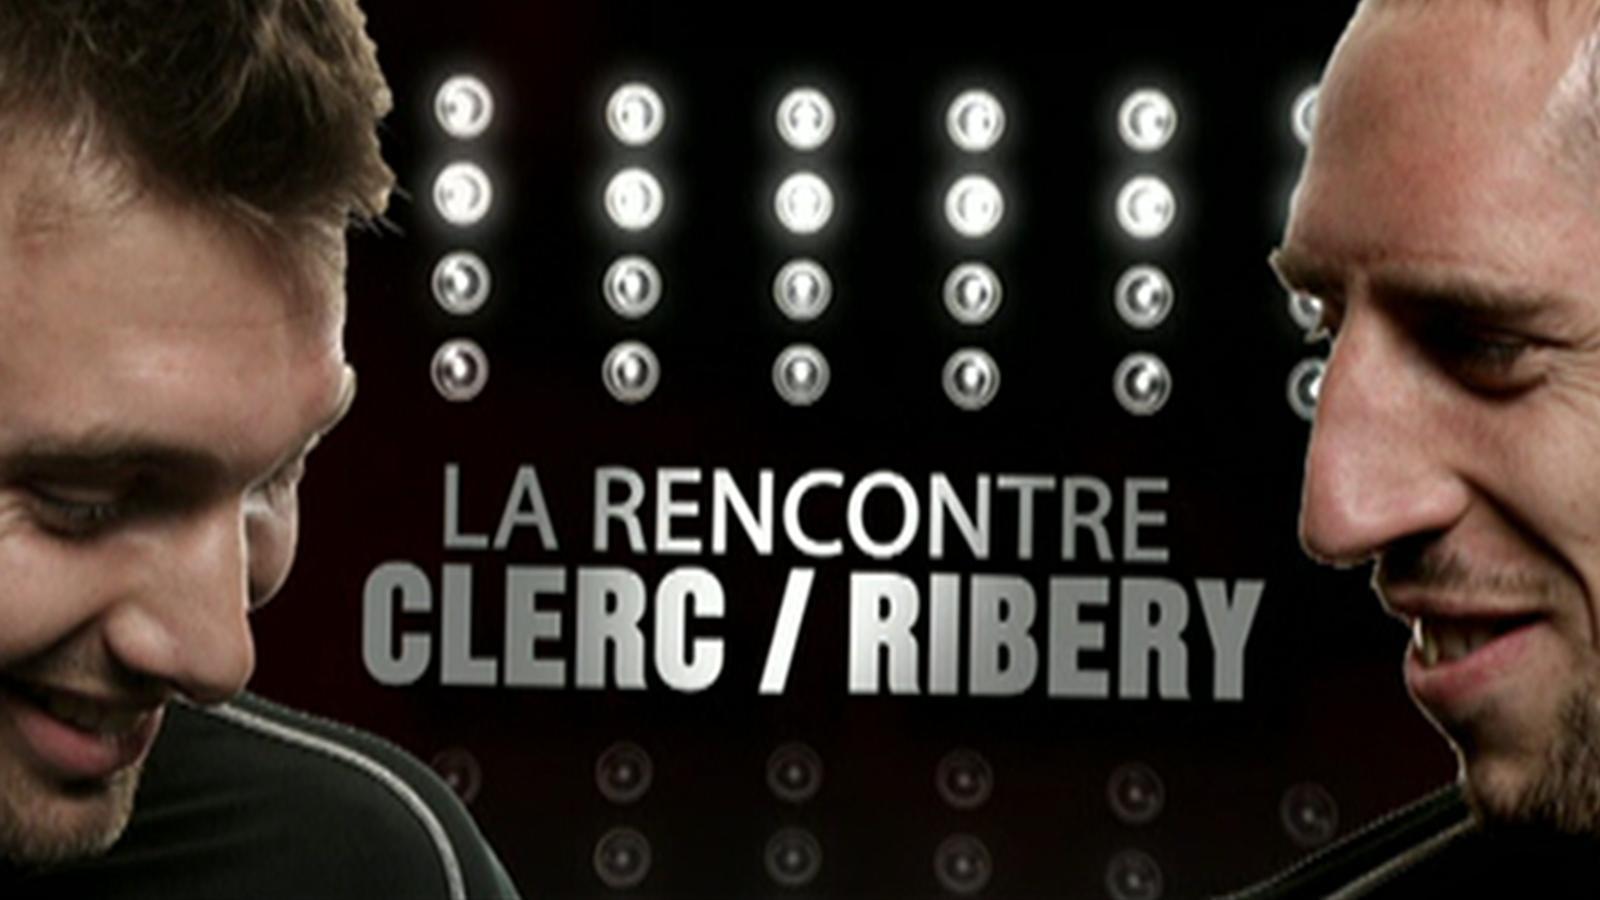 Le duel Clerc-Ribéry